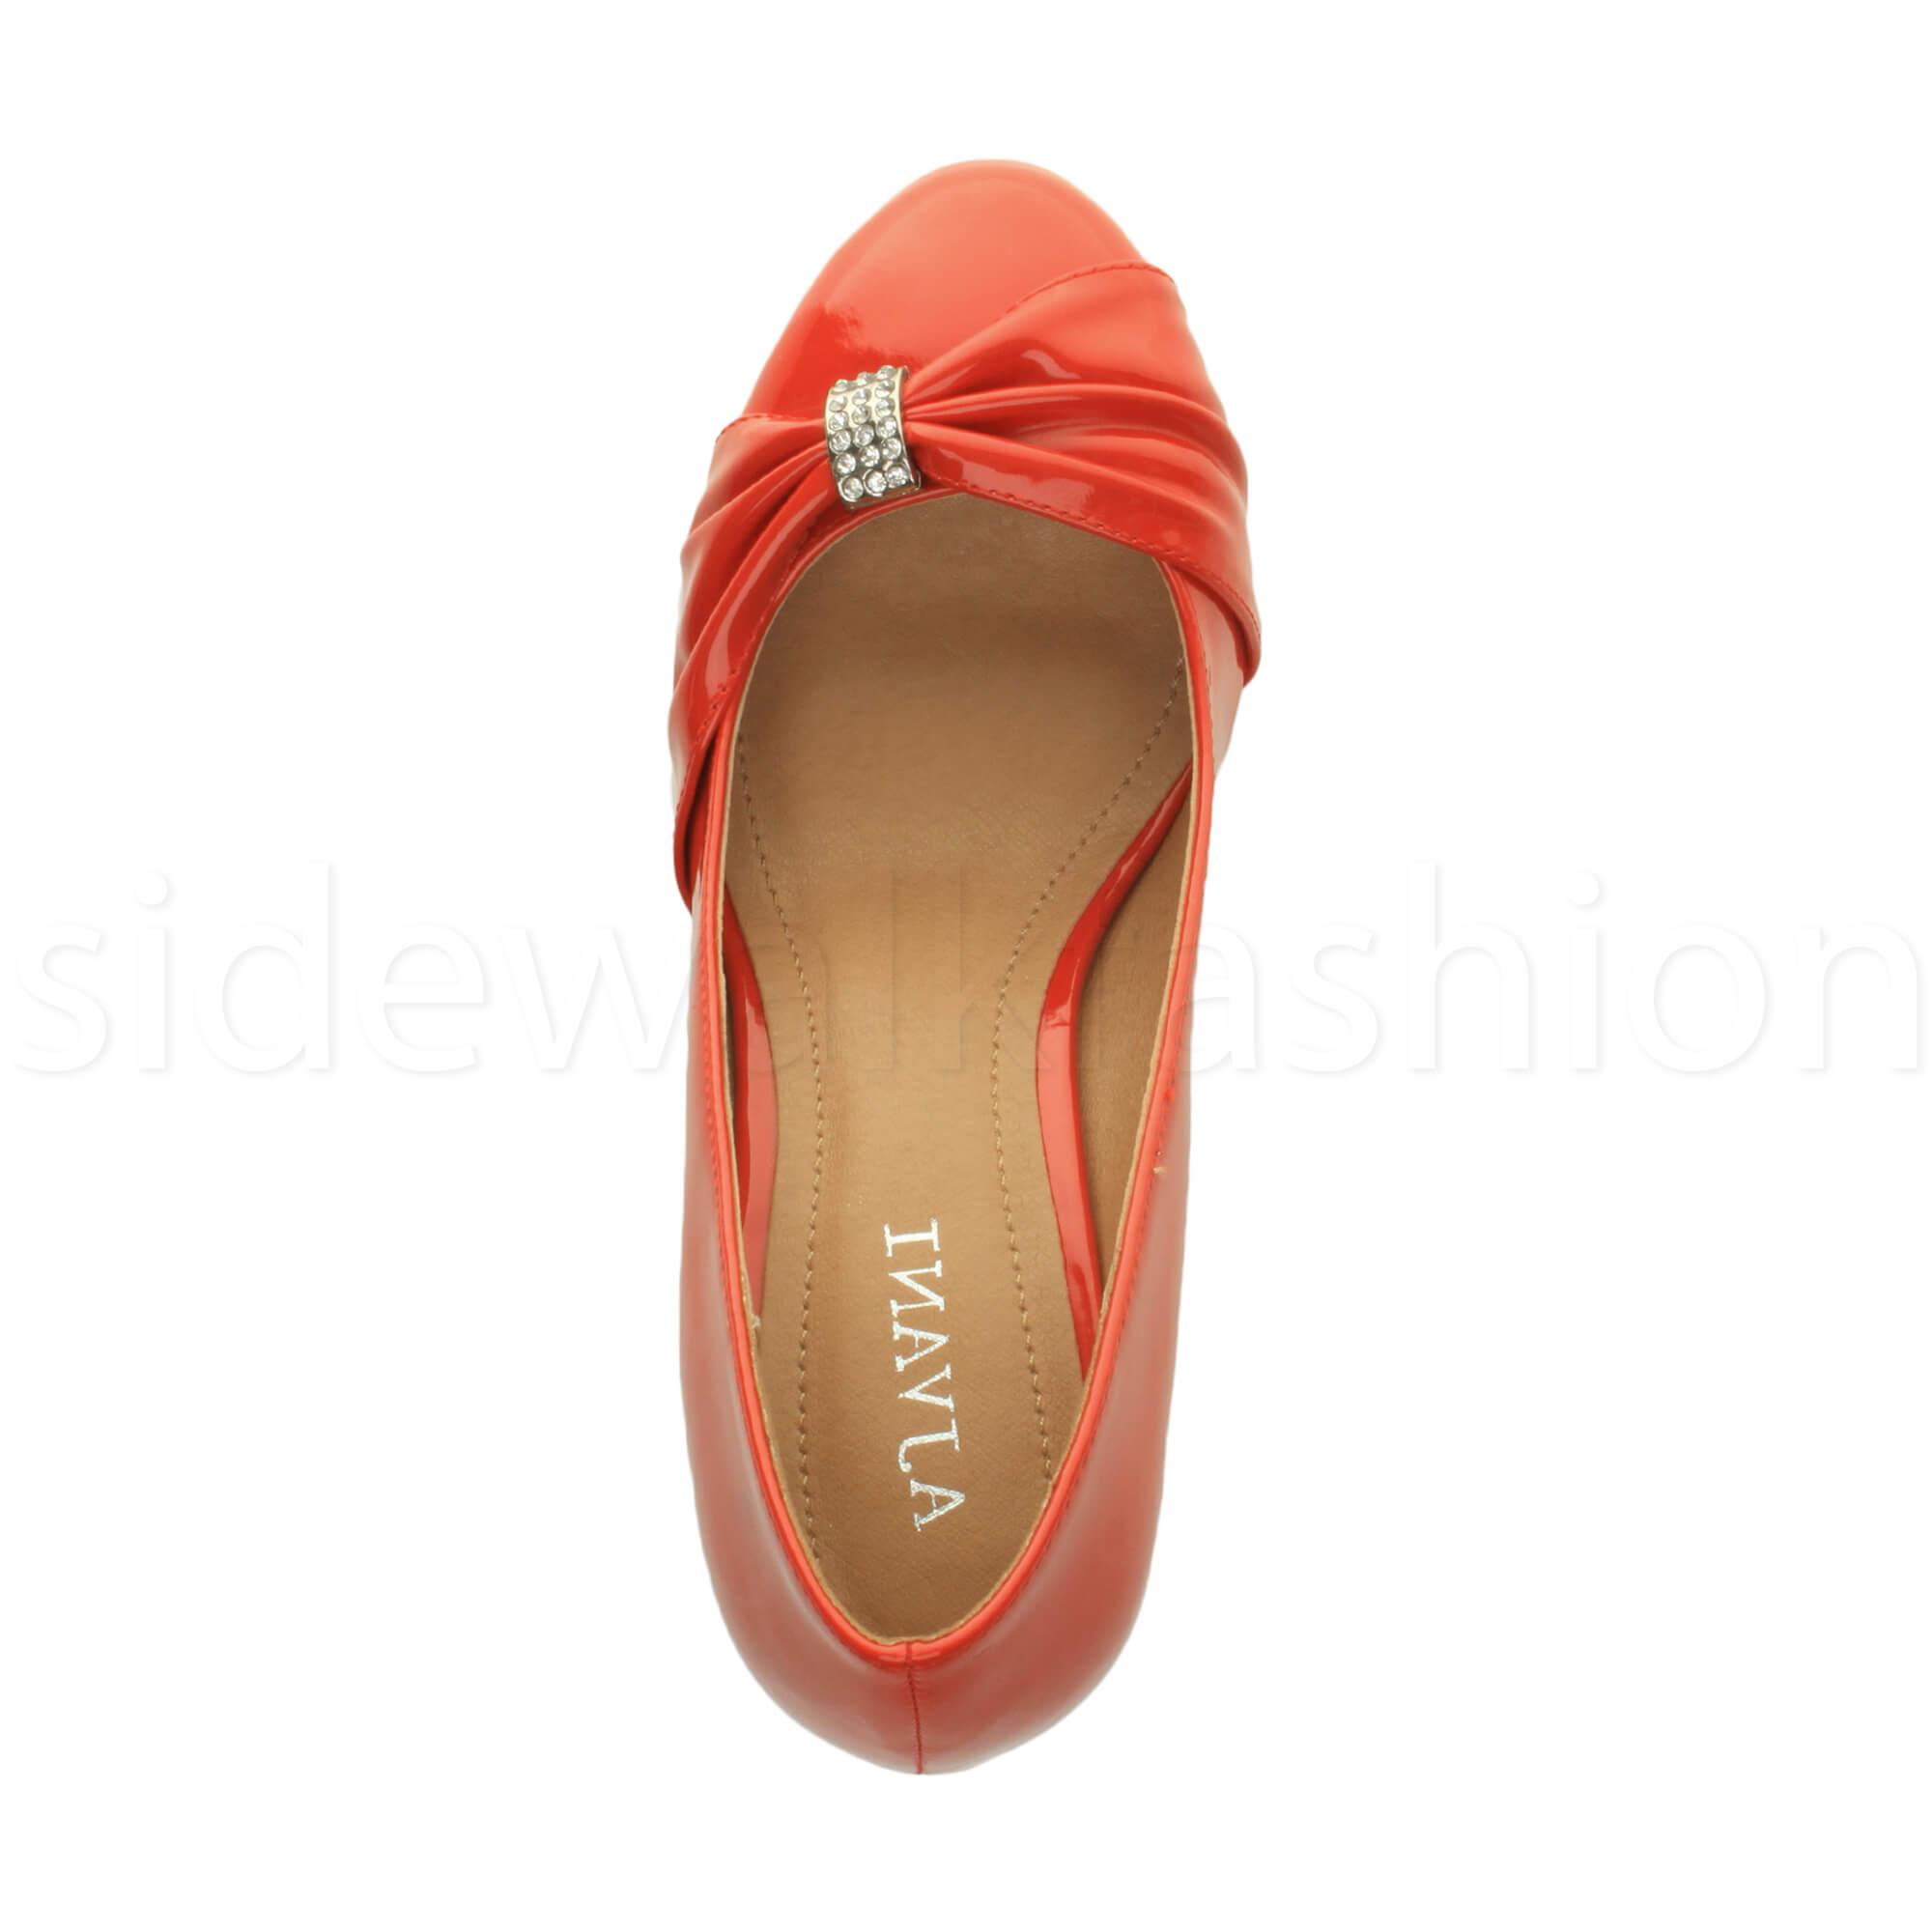 Womens-ladies-low-mid-heel-diamante-party-smart-evening-court-shoes-size thumbnail 80